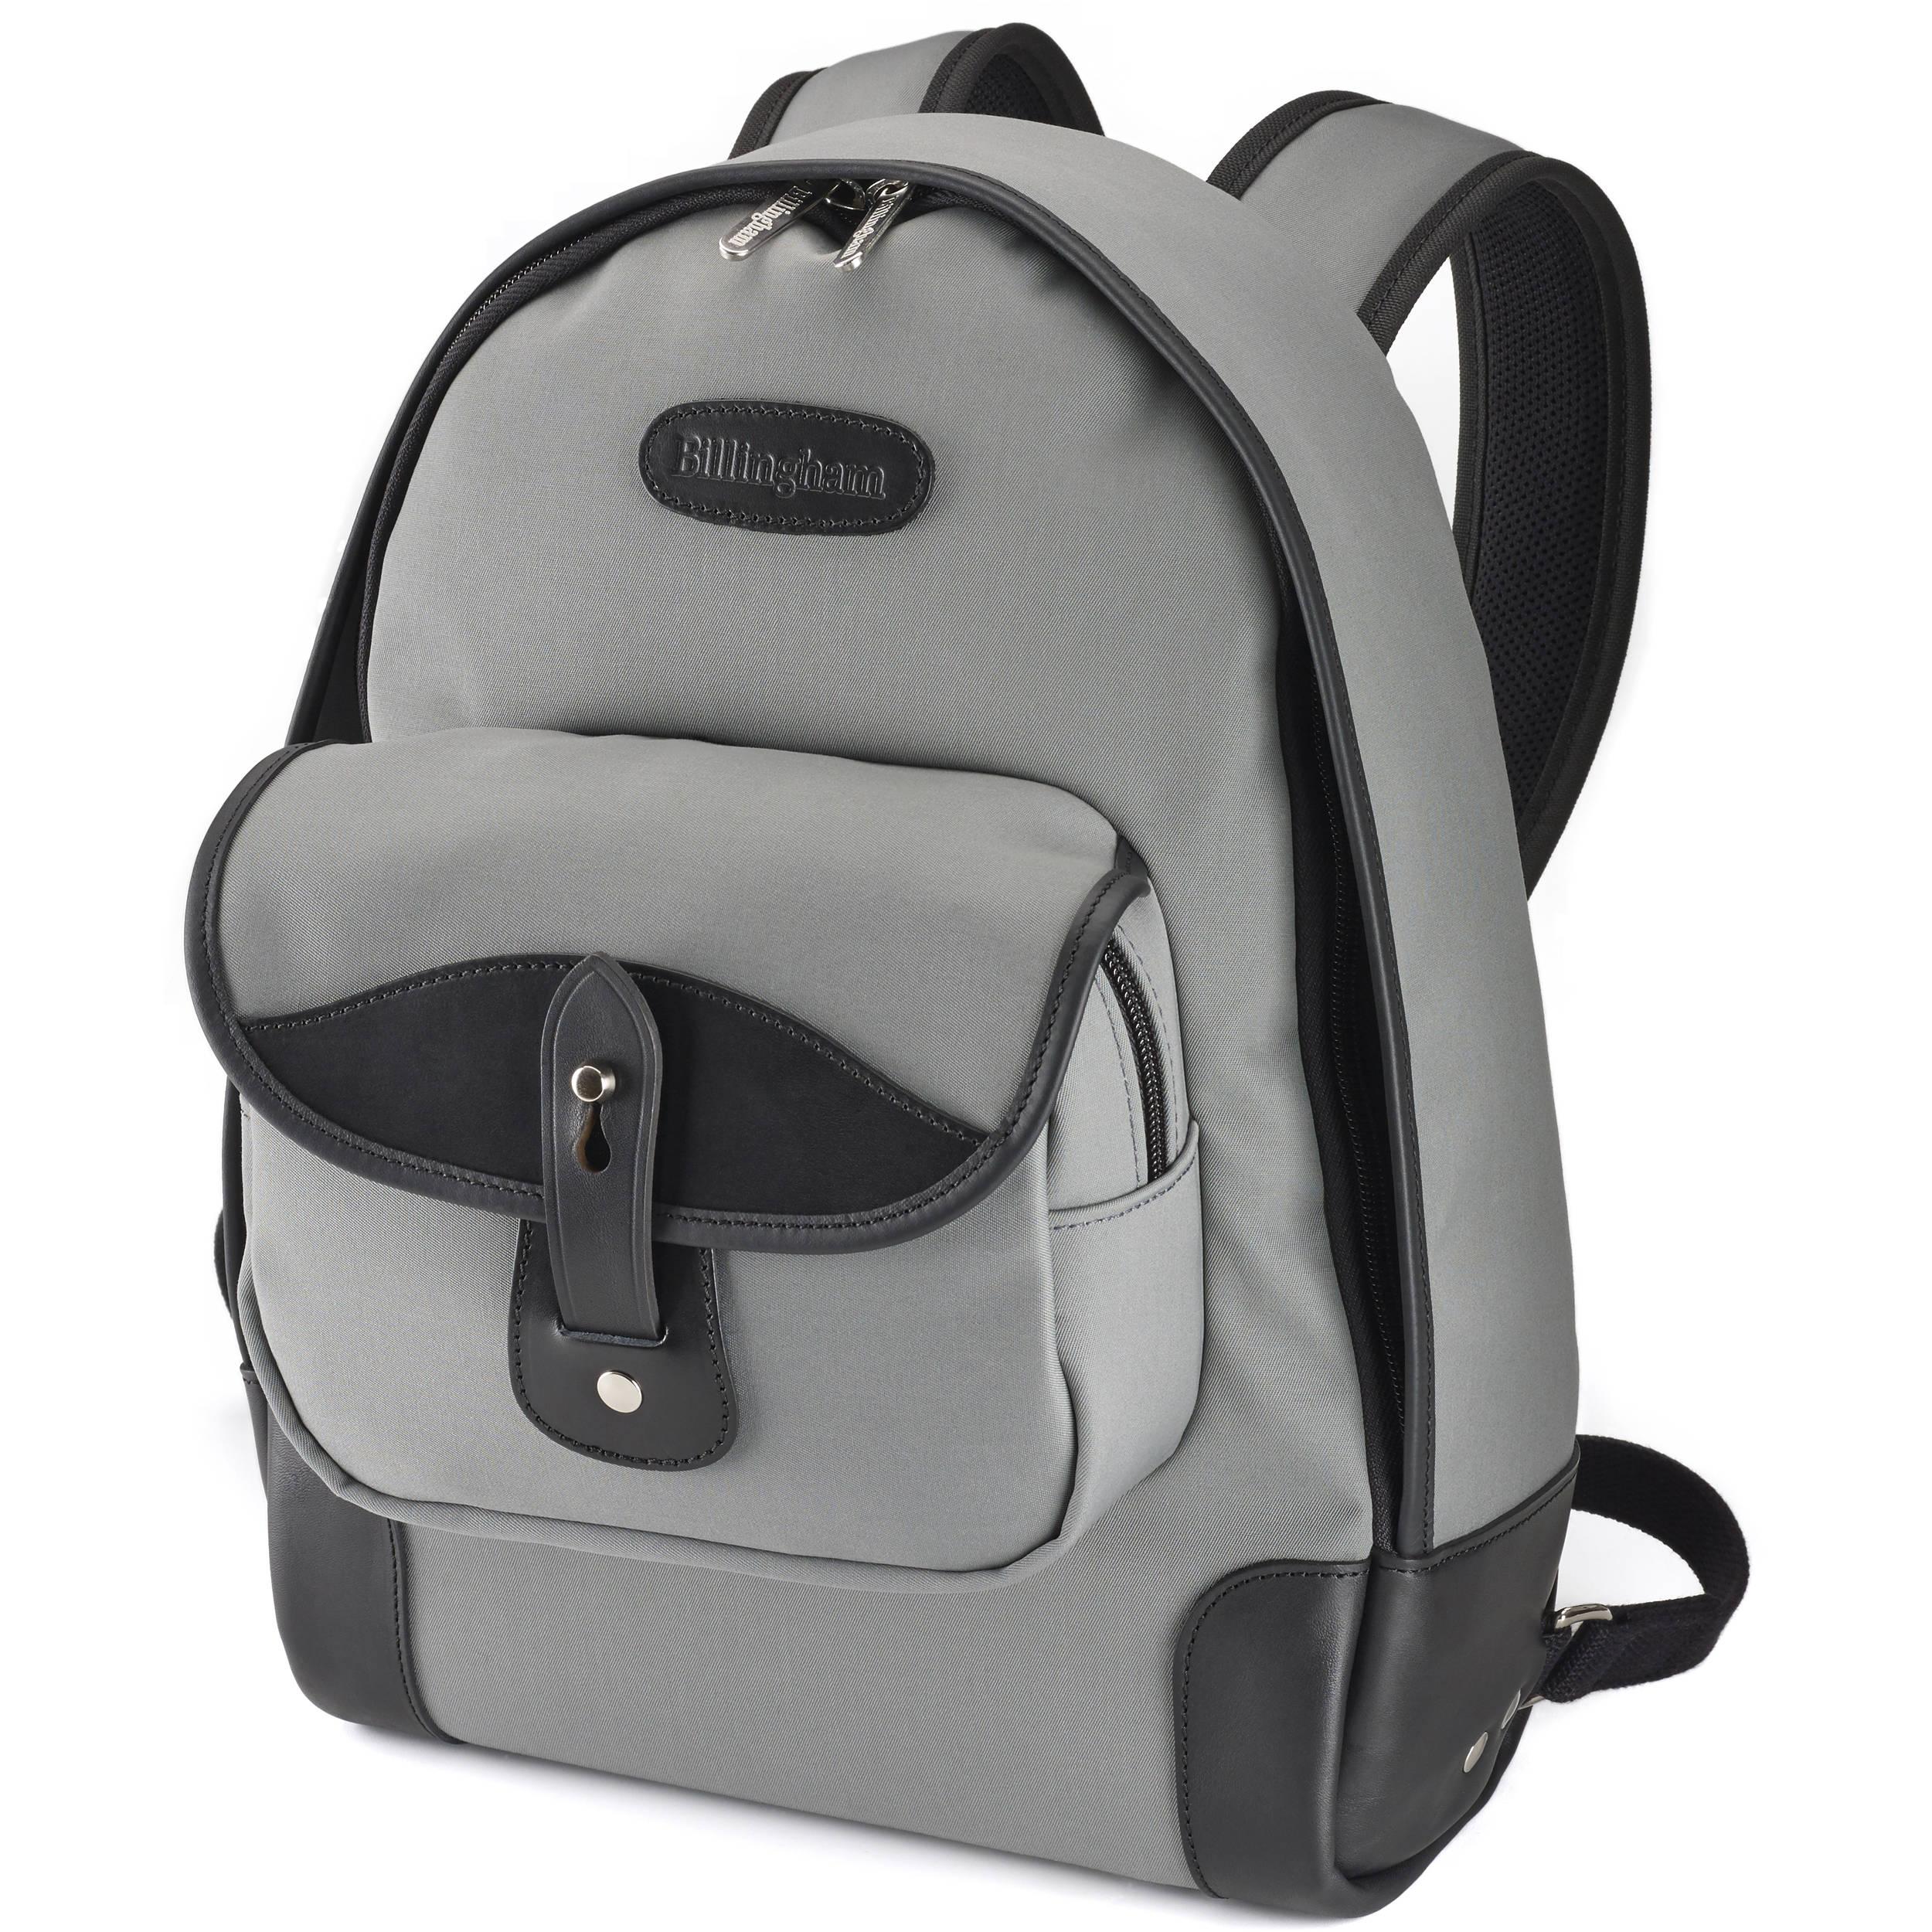 0d507aea06c885 Billingham Rucksack 35 (Gray Canvas/Black Leather) 503125-01 B&H